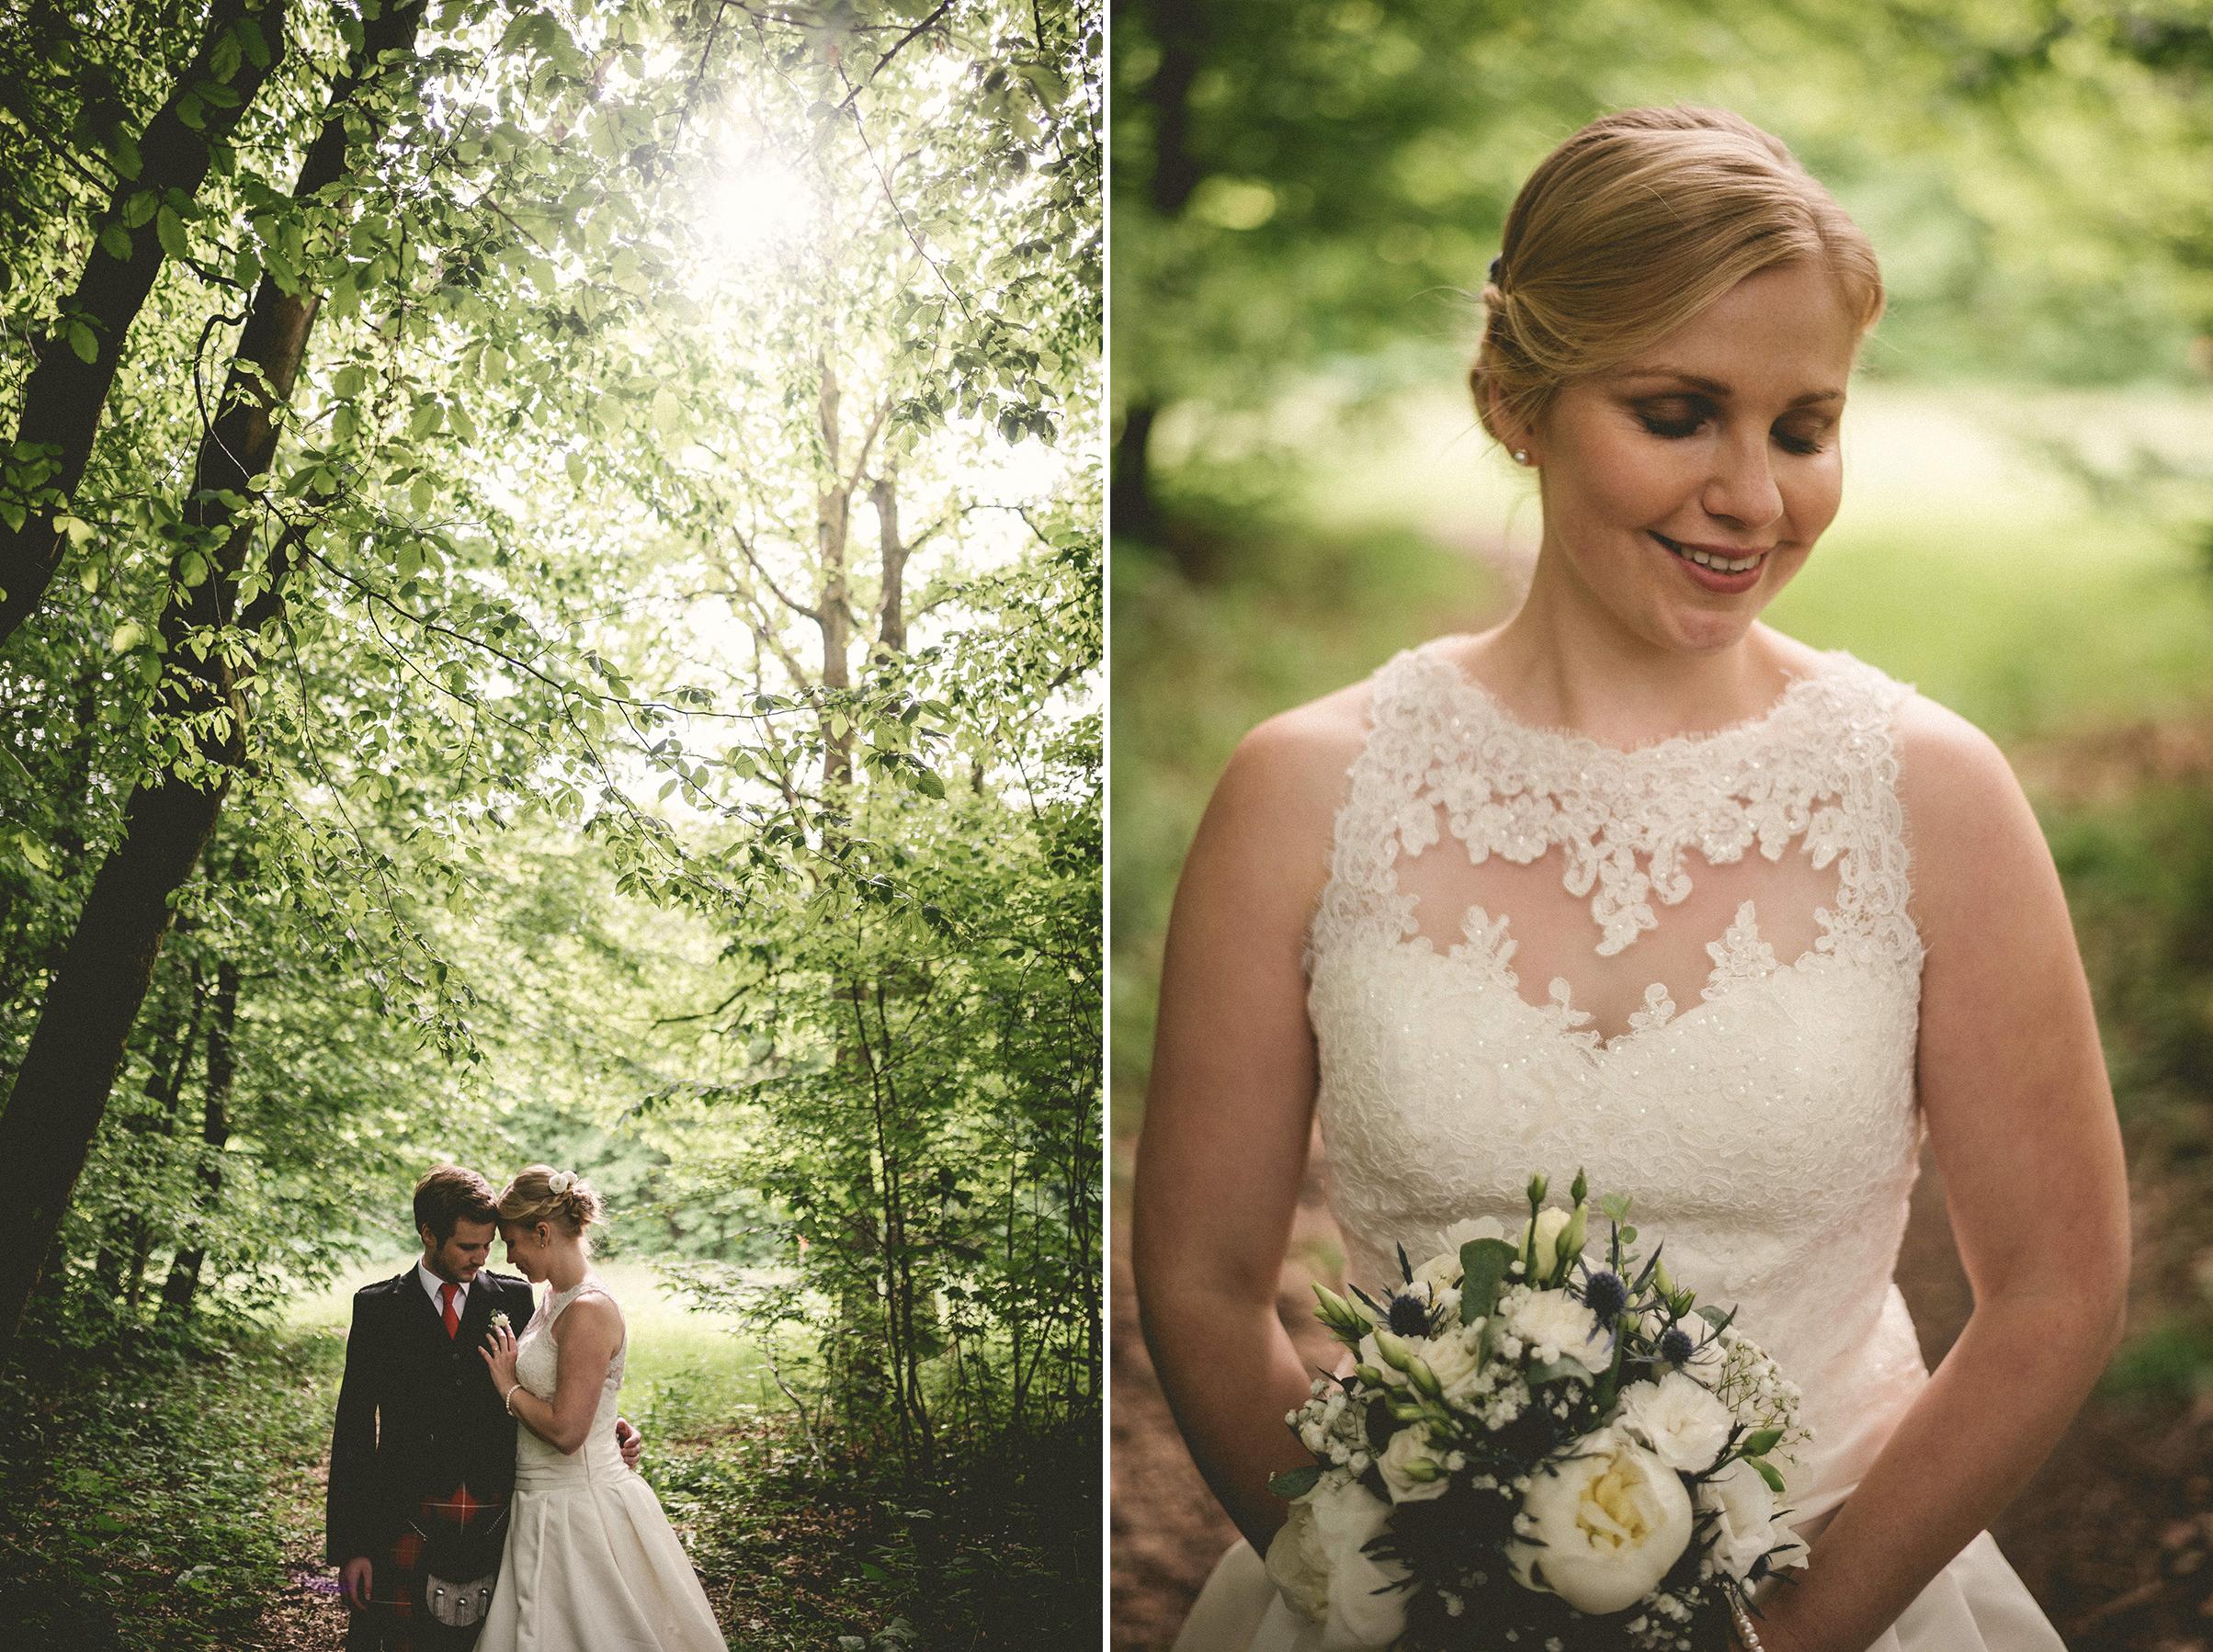 Hochzeit-Fotografie-Aachen-Eilendorf-Vaals-De-Bokerijder-Dreamcatcher-Photography-Fotograf (34)